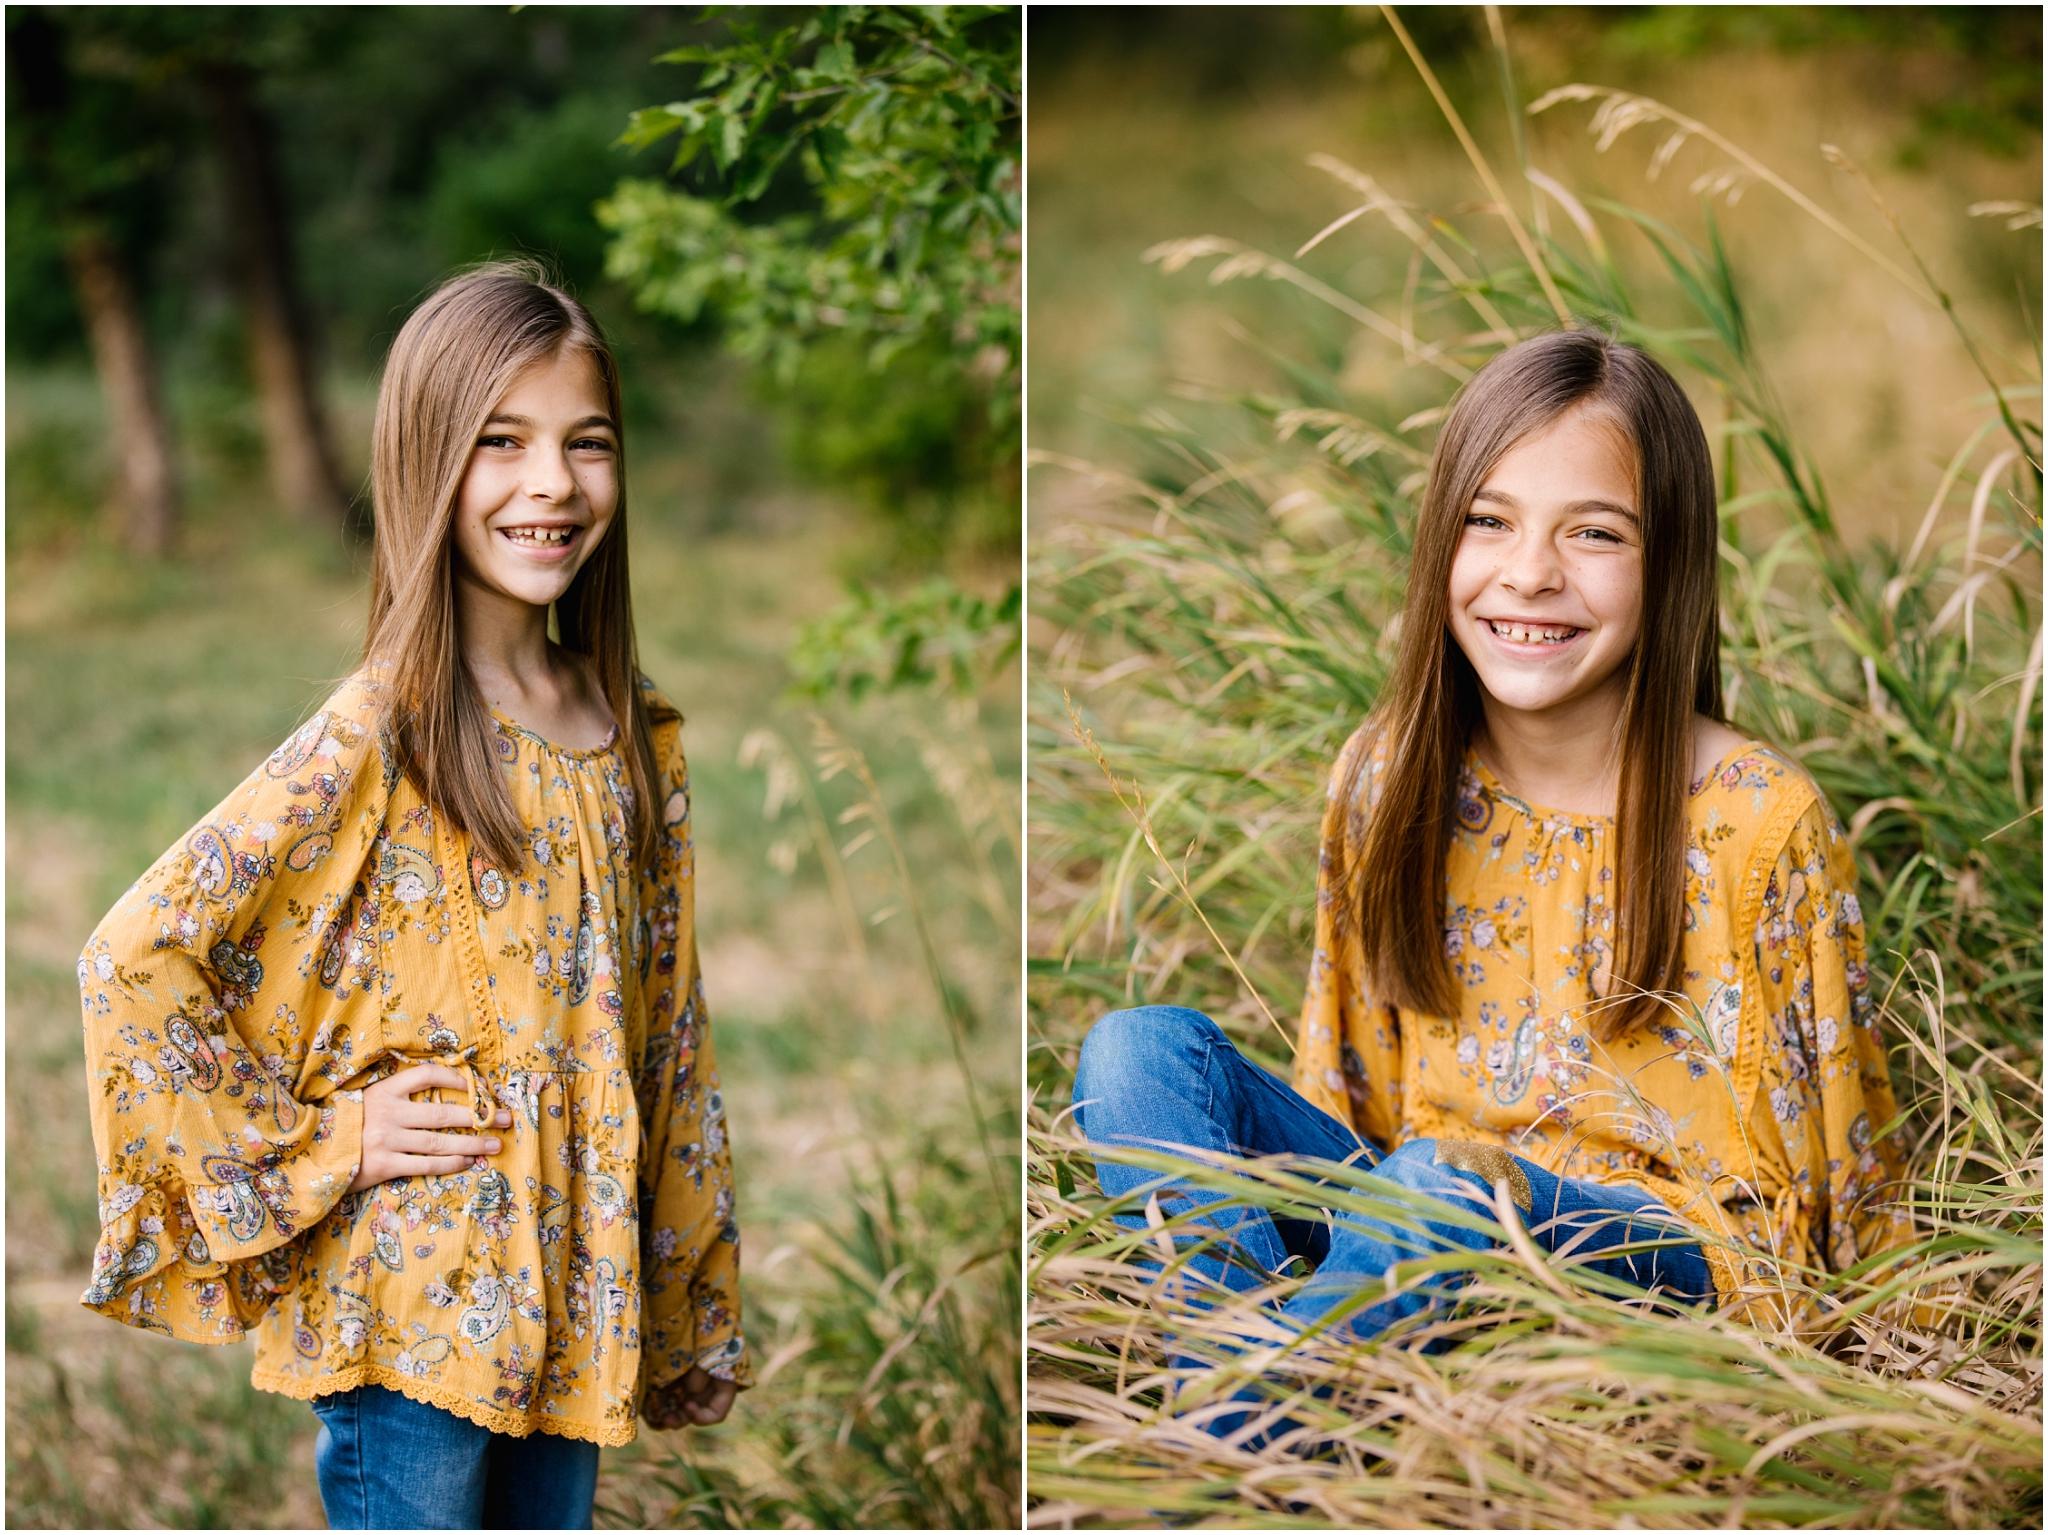 Hurst-21_Lizzie-B-Imagery-Utah-Family-Photographer-Hobble-Creek-Canyon-Jolleys-Ranch-Utah-County.jpg